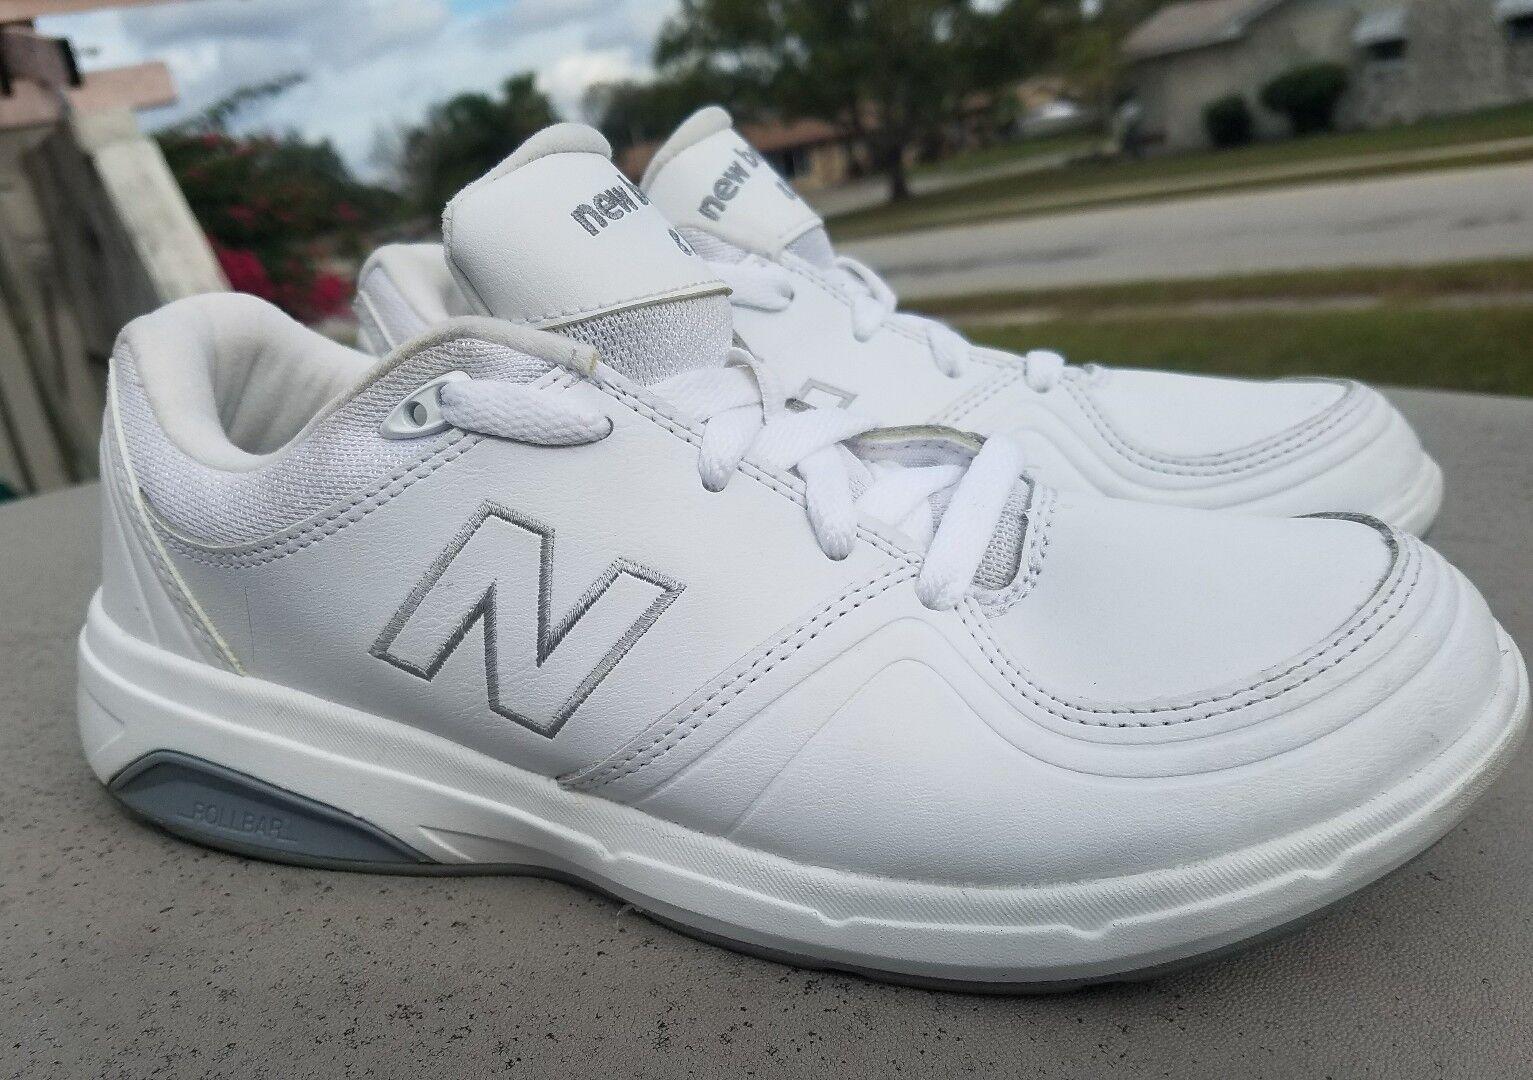 Femme New Balance 813 Walking  chaussures   WW813WT  Sz 9 M Retail